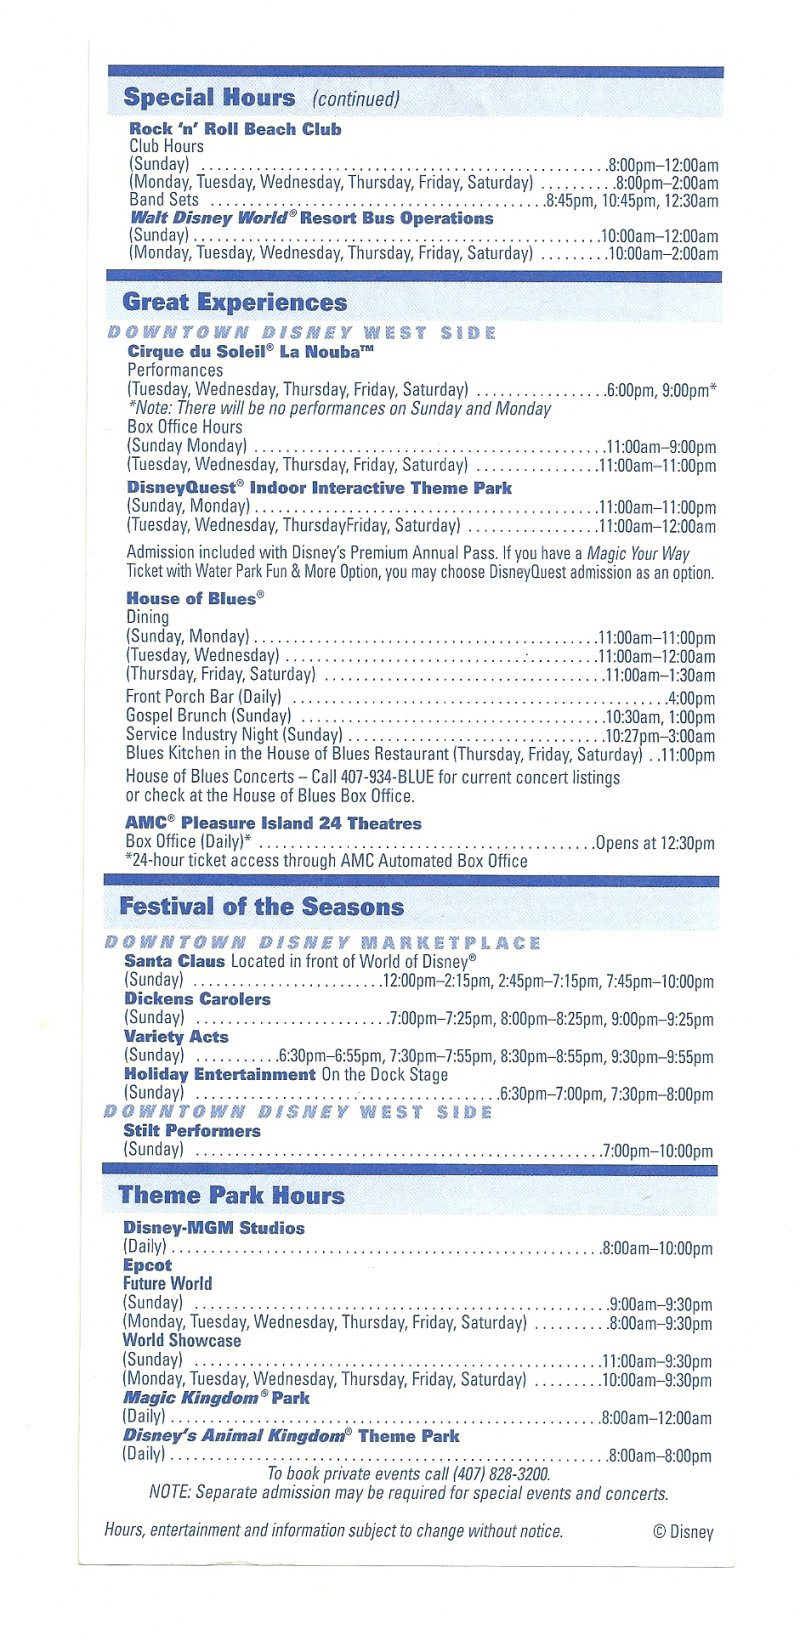 Image 1 of 2006 walt disney world Downtown Disney Times guide Flyer Dec 24-30